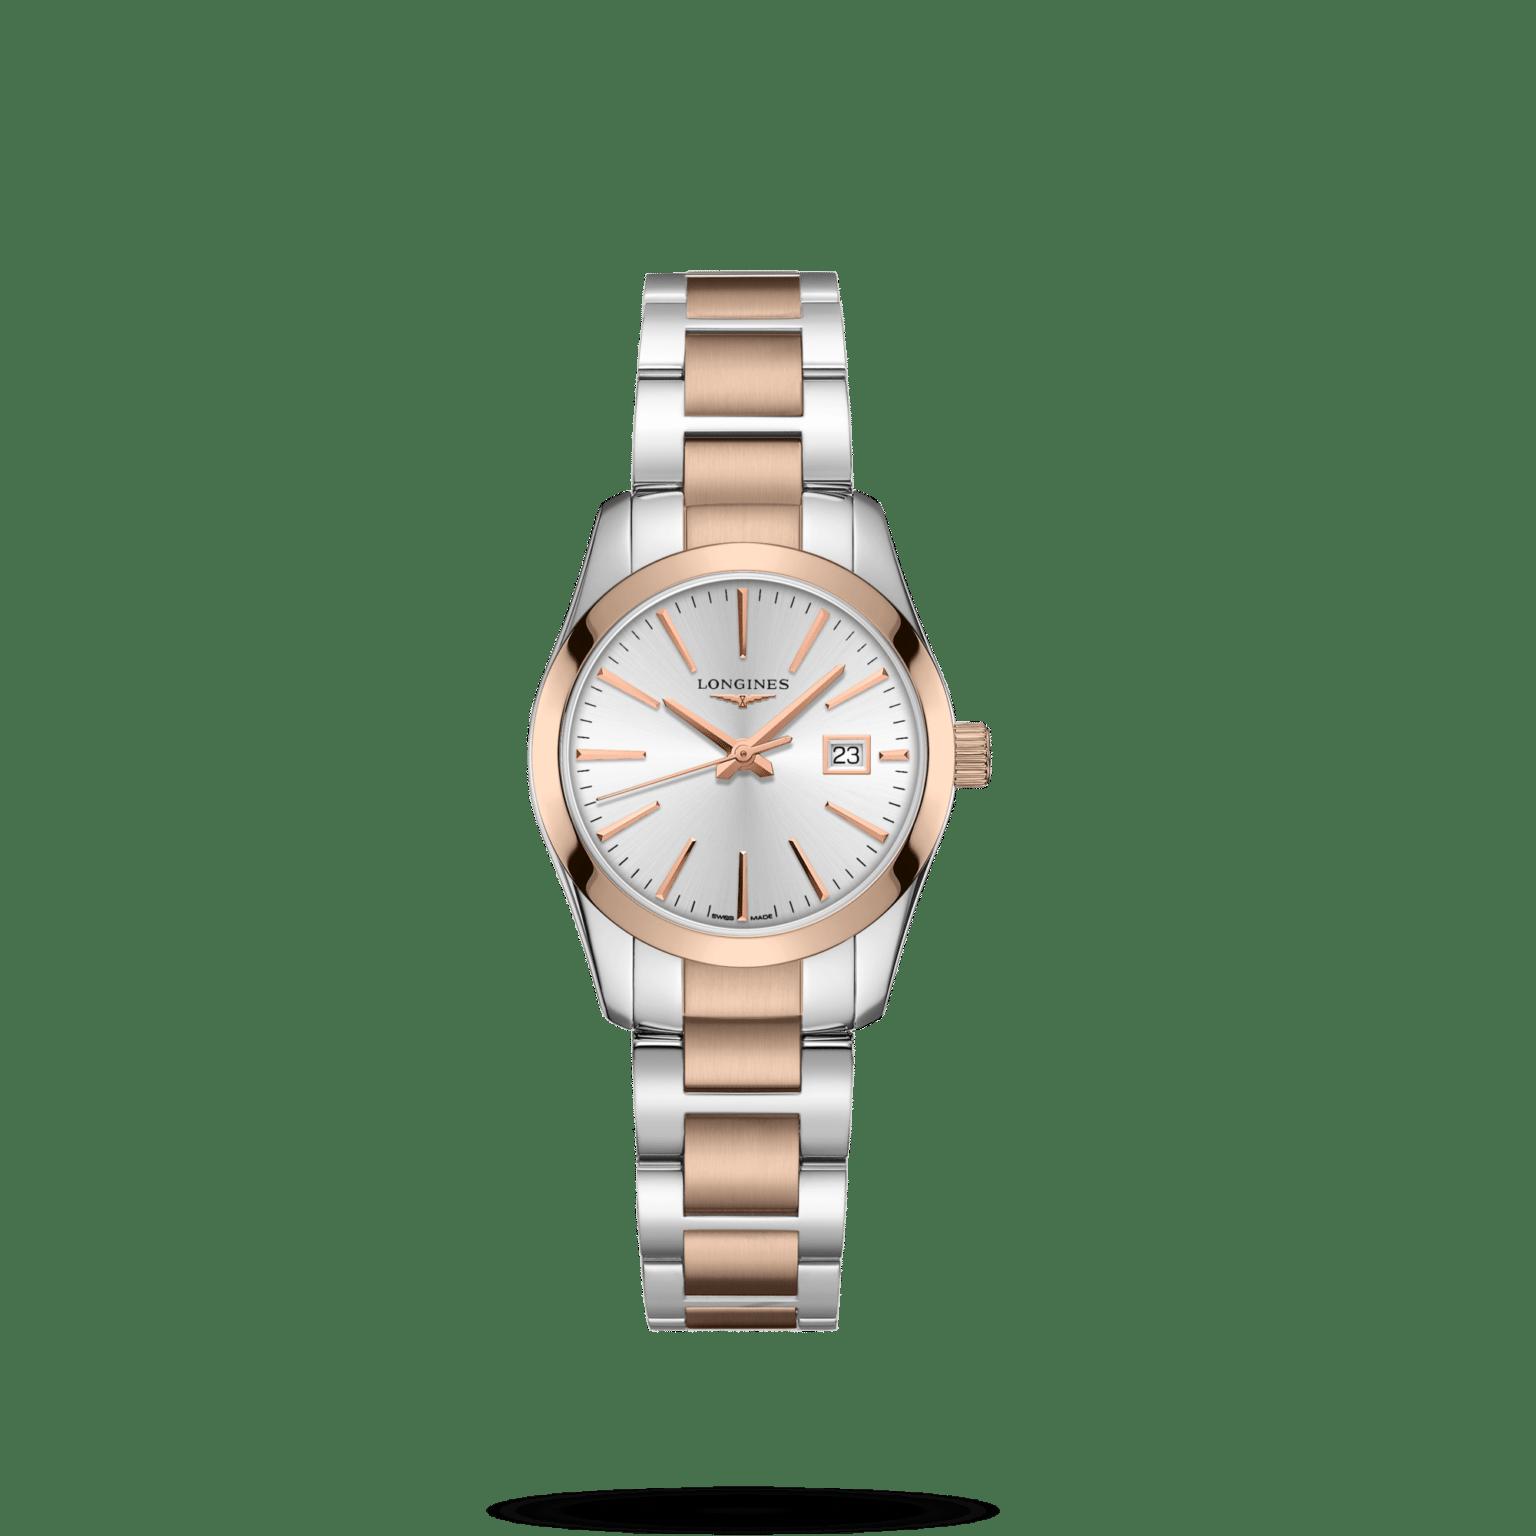 Longines – Conquest Classic – Conquest Classic - Wagner Bijouterie Uhren